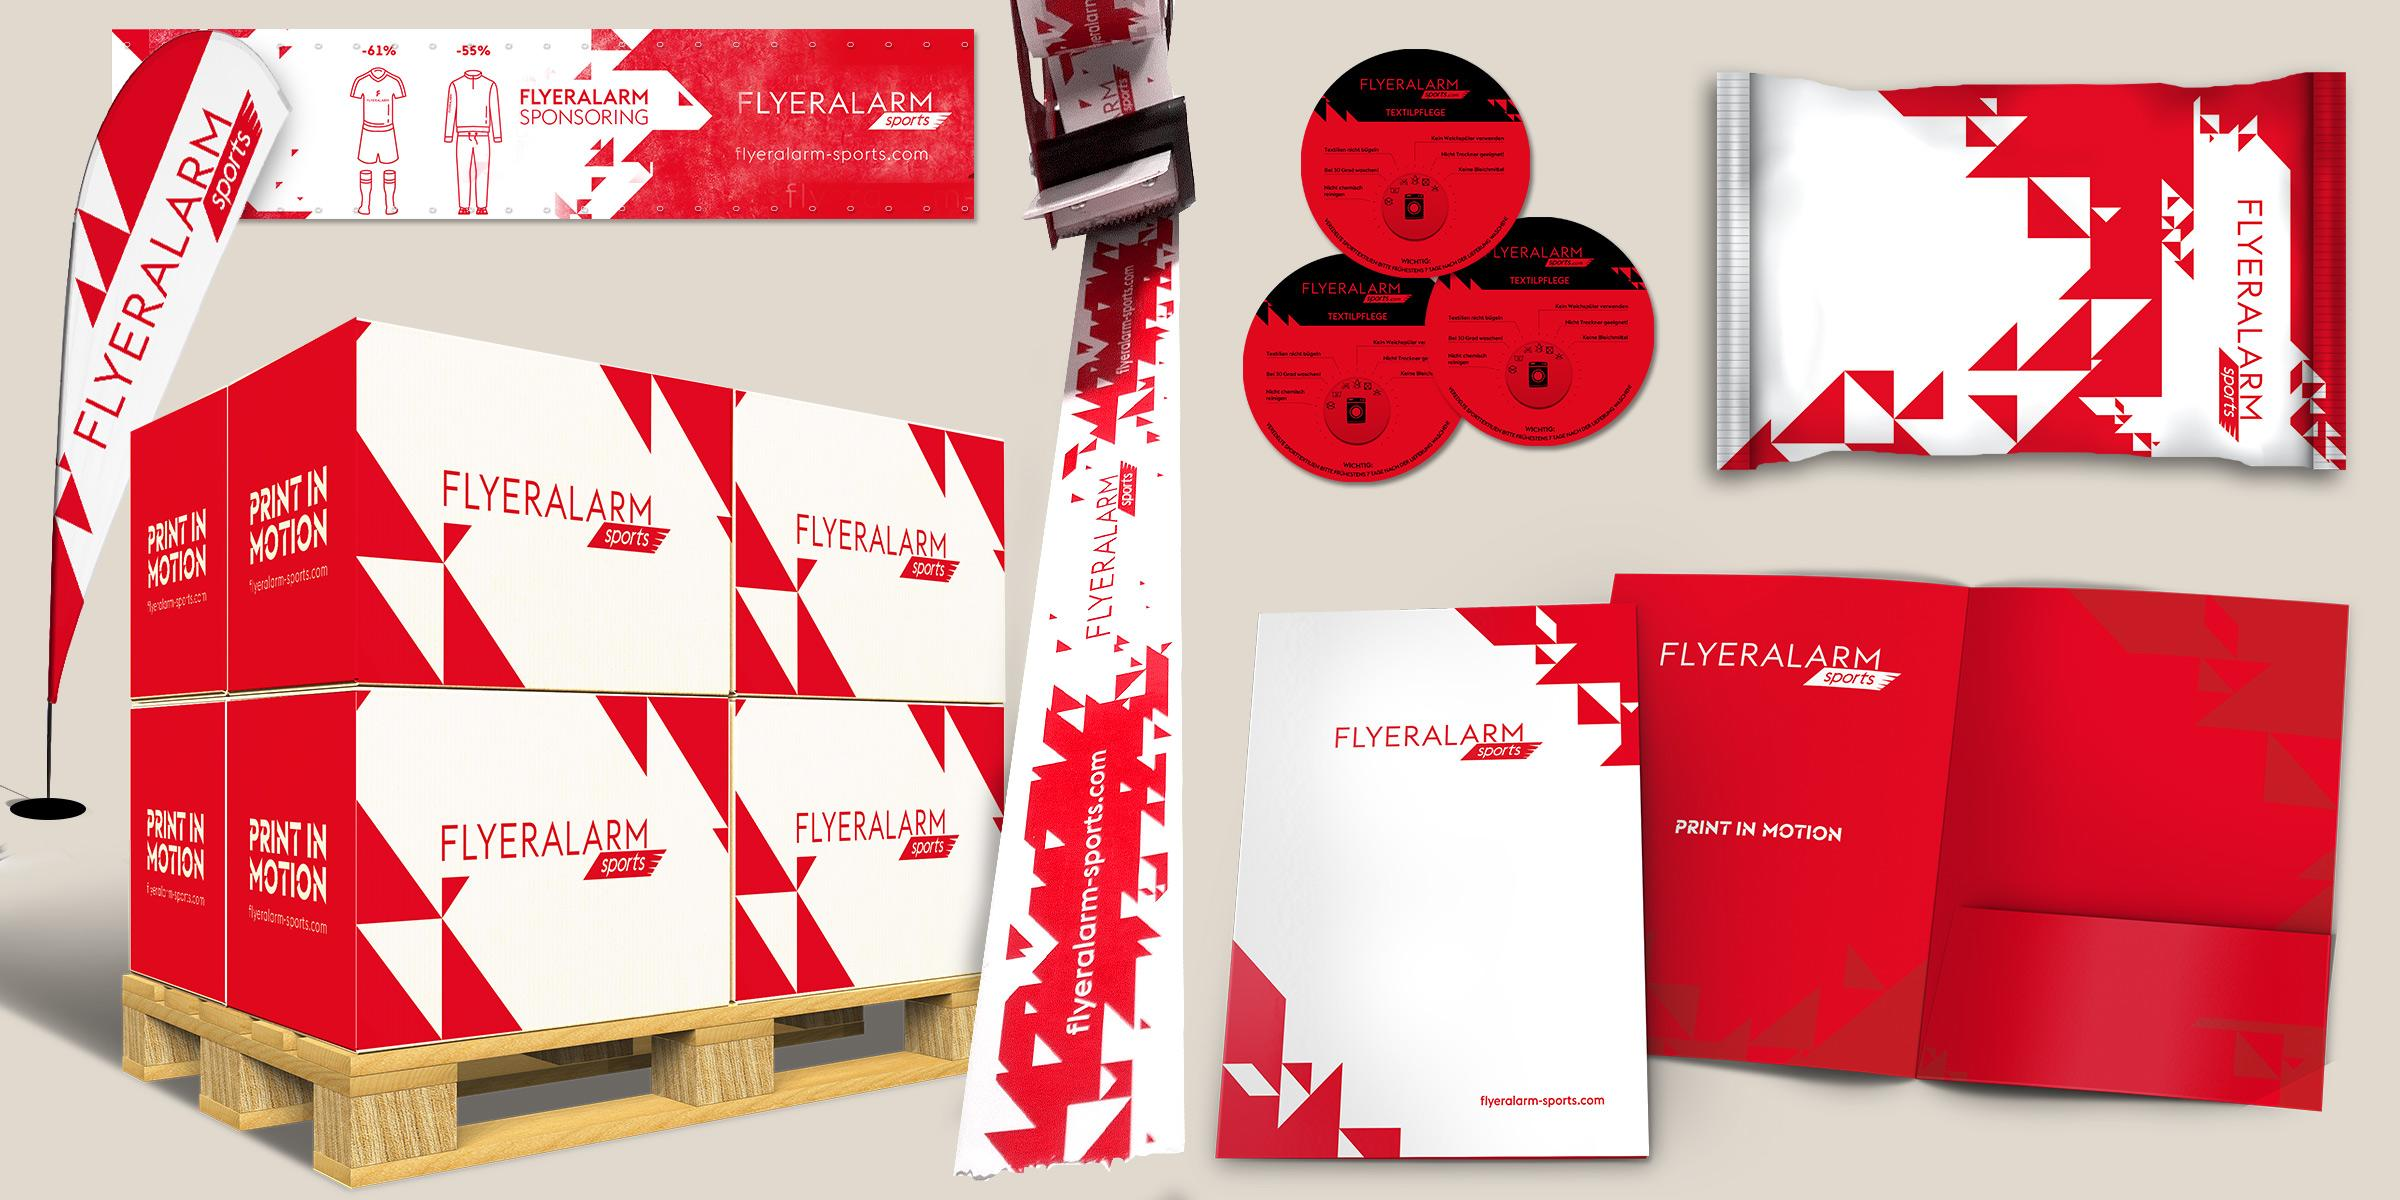 10 gfd gregor fenger designworks for fa sports de branding corporate design smm sma social media marketing online